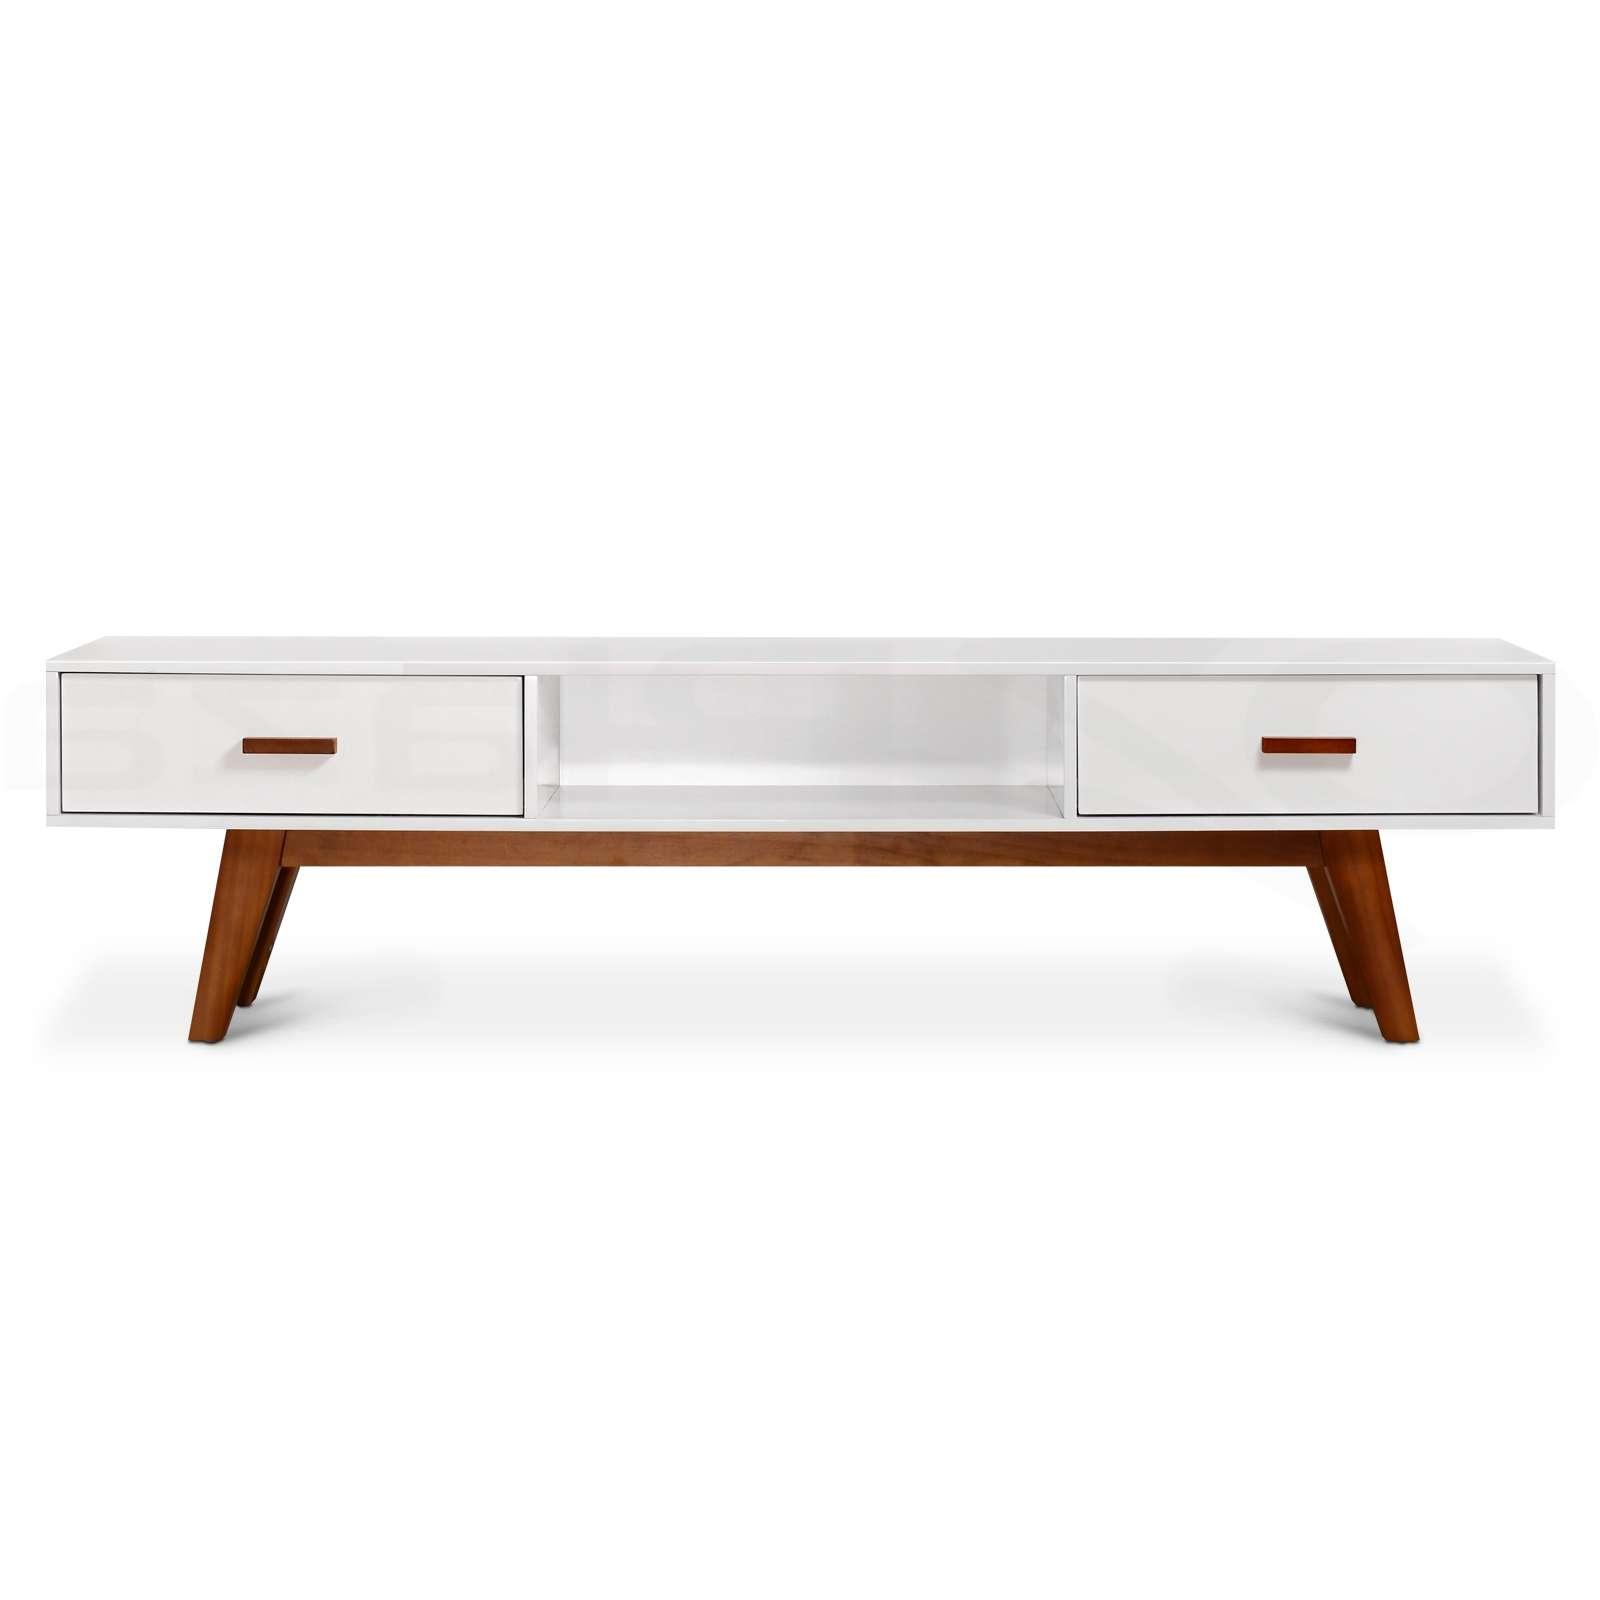 Tv Stand Cabinet Scandinavian Retro Lowline Furniture In Scandinavian Design Tv Cabinets (View 20 of 20)